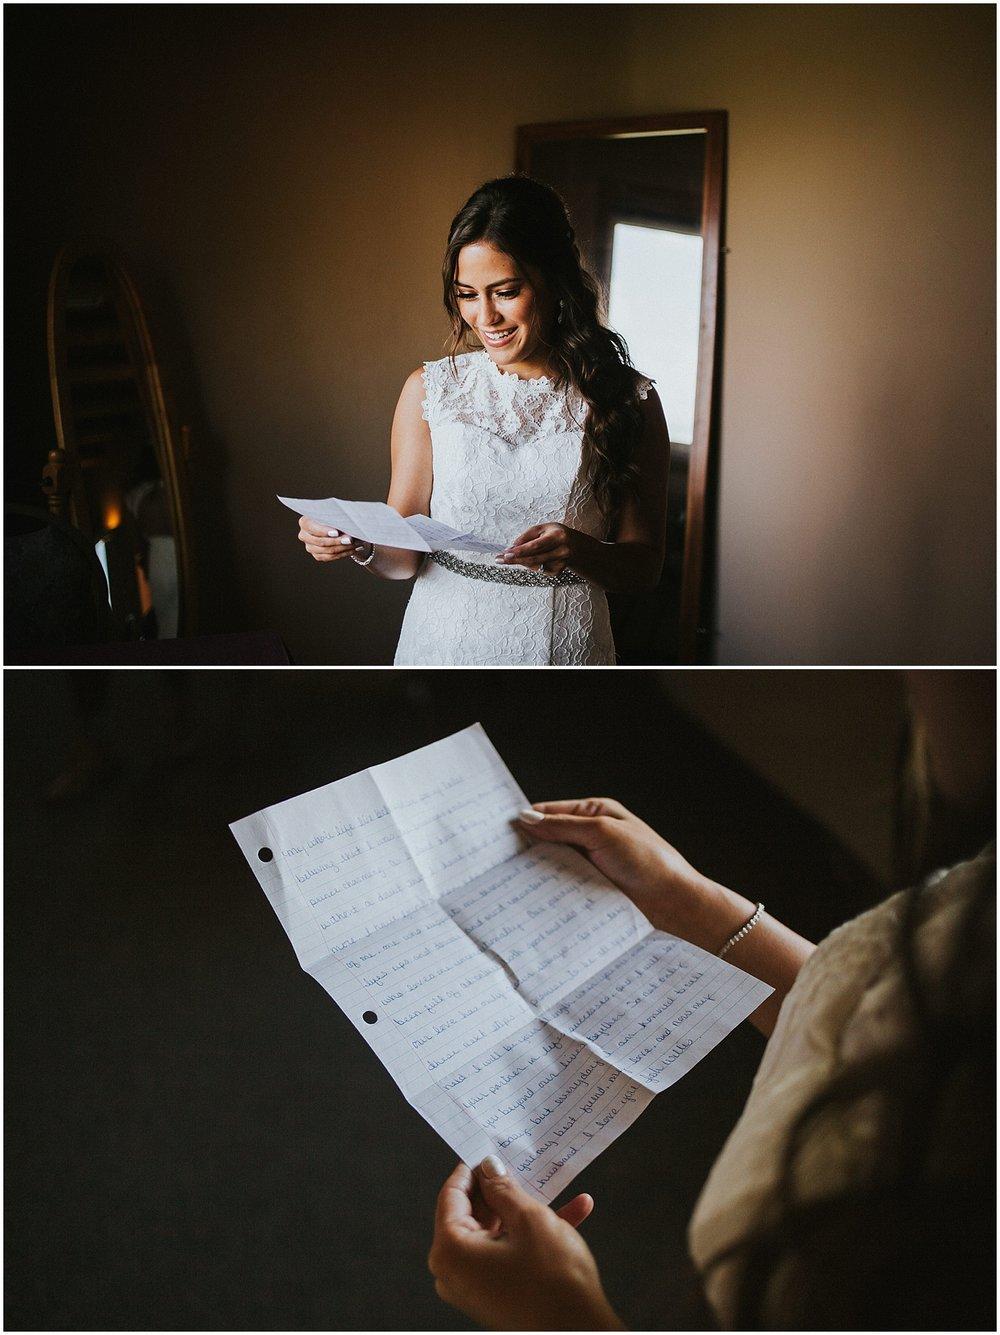 Prairie-Star-Restaurant_Wedding-Photos_Santa-Ana-Pueblo-New-Mexico_Albuquerque-New-Mexico-Wedding-Photographer_0012.jpg